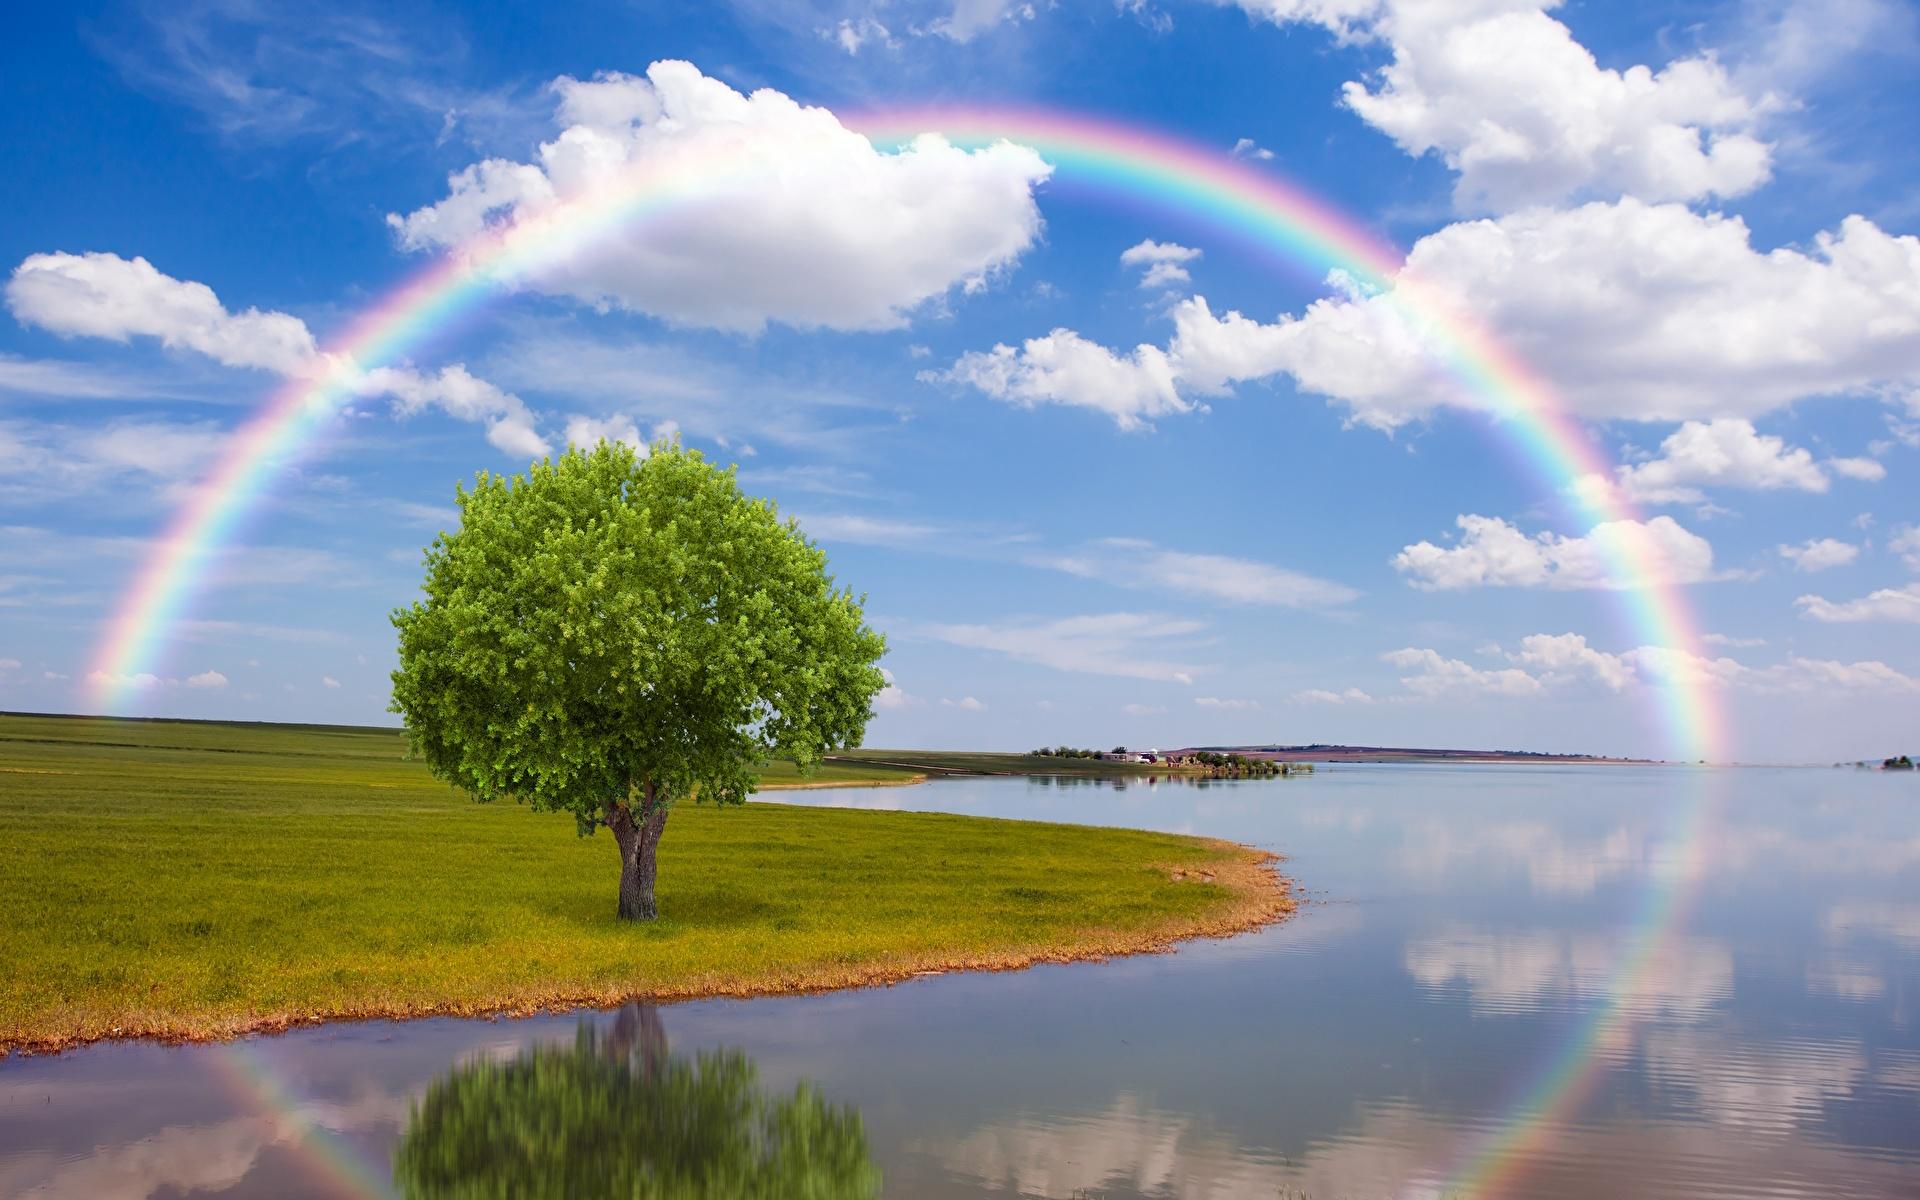 Bilder von Natur Regenbogen Himmel Flusse Wolke Bäume 1920x1200 Fluss